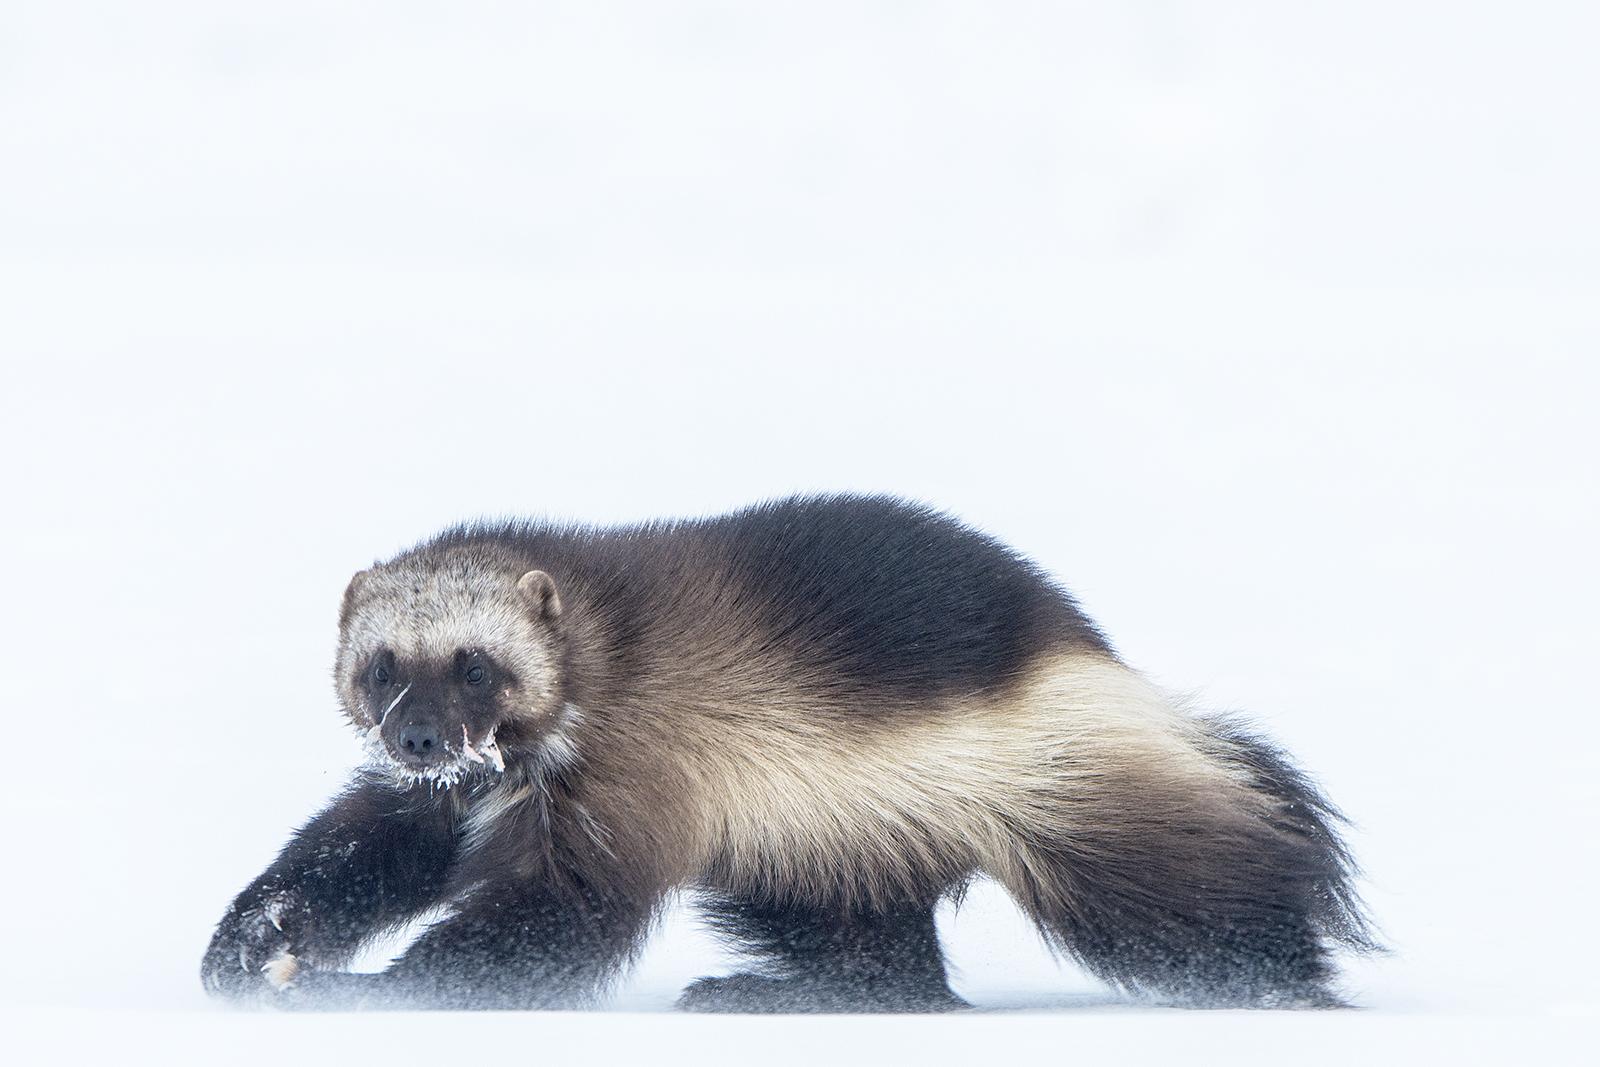 A wolverine walks across the snow